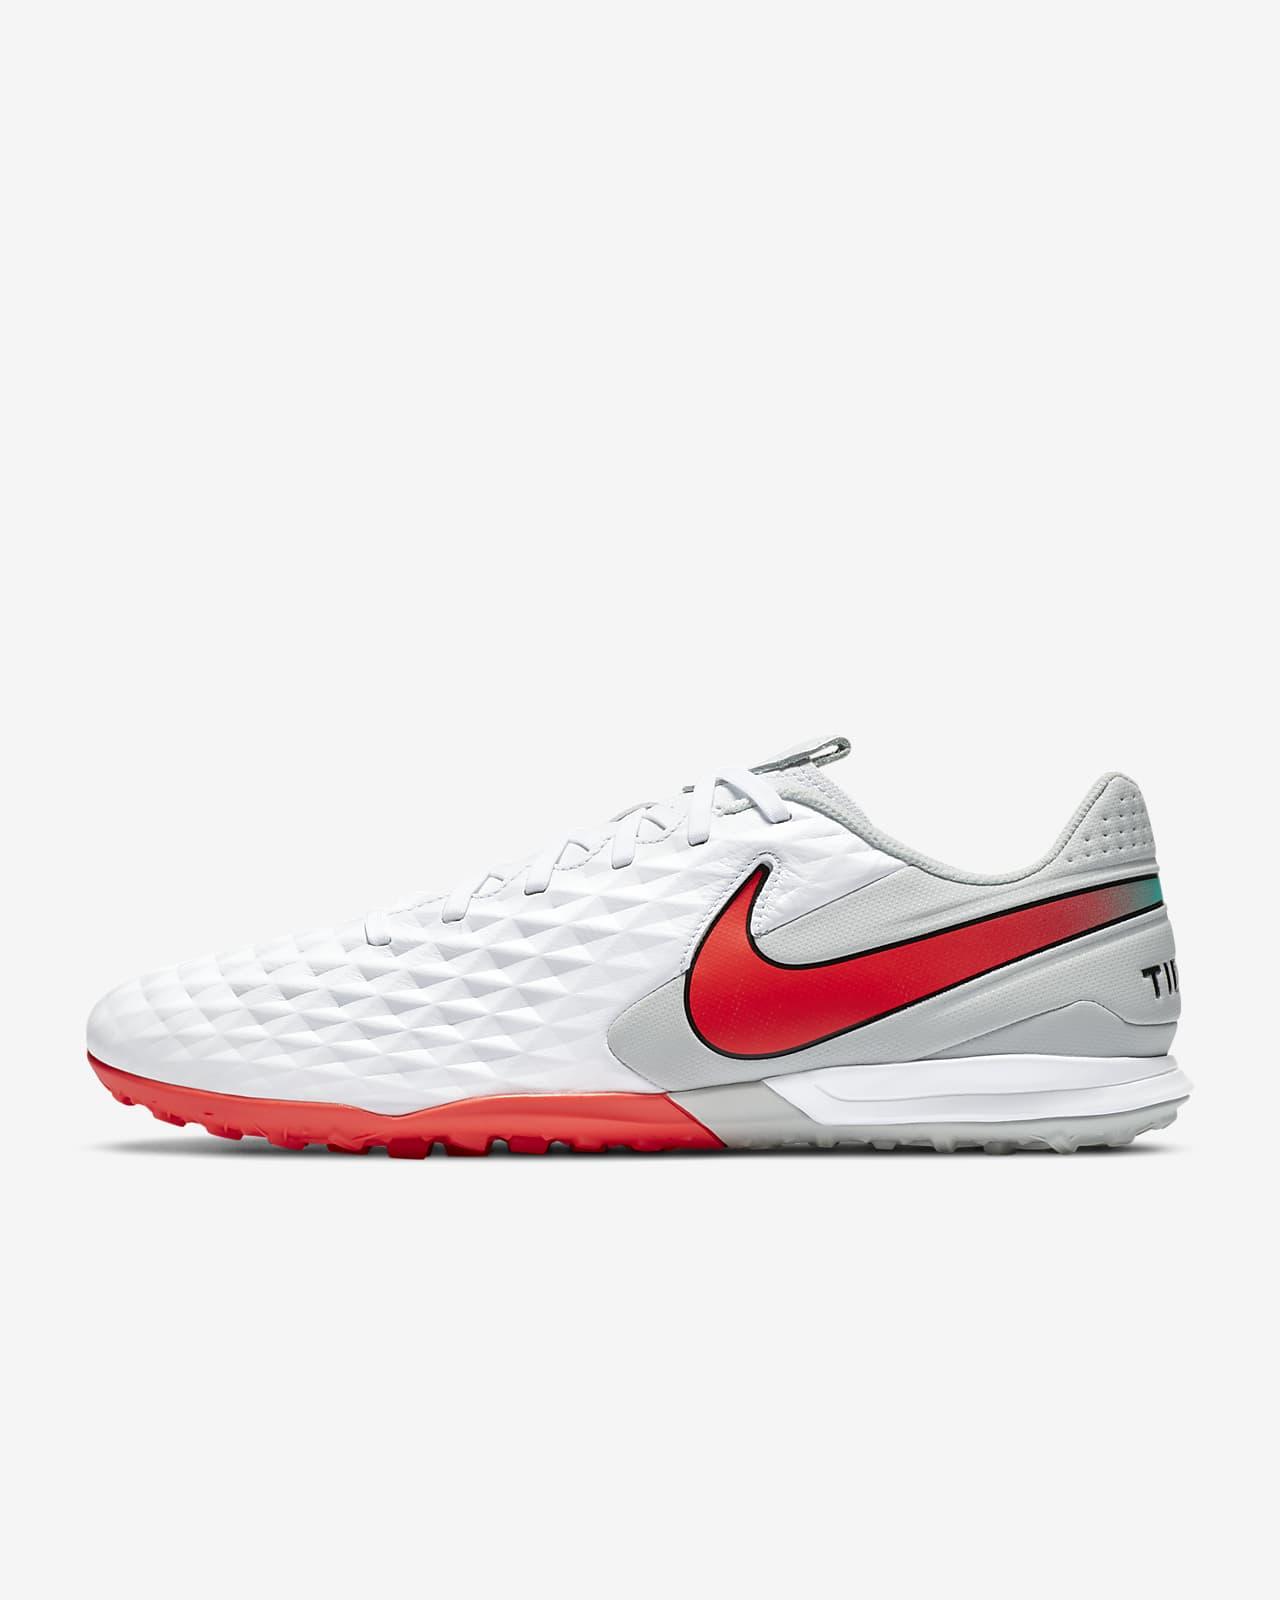 Fotbollssko för grus/turf Nike Tiempo Legend 8 Academy TF